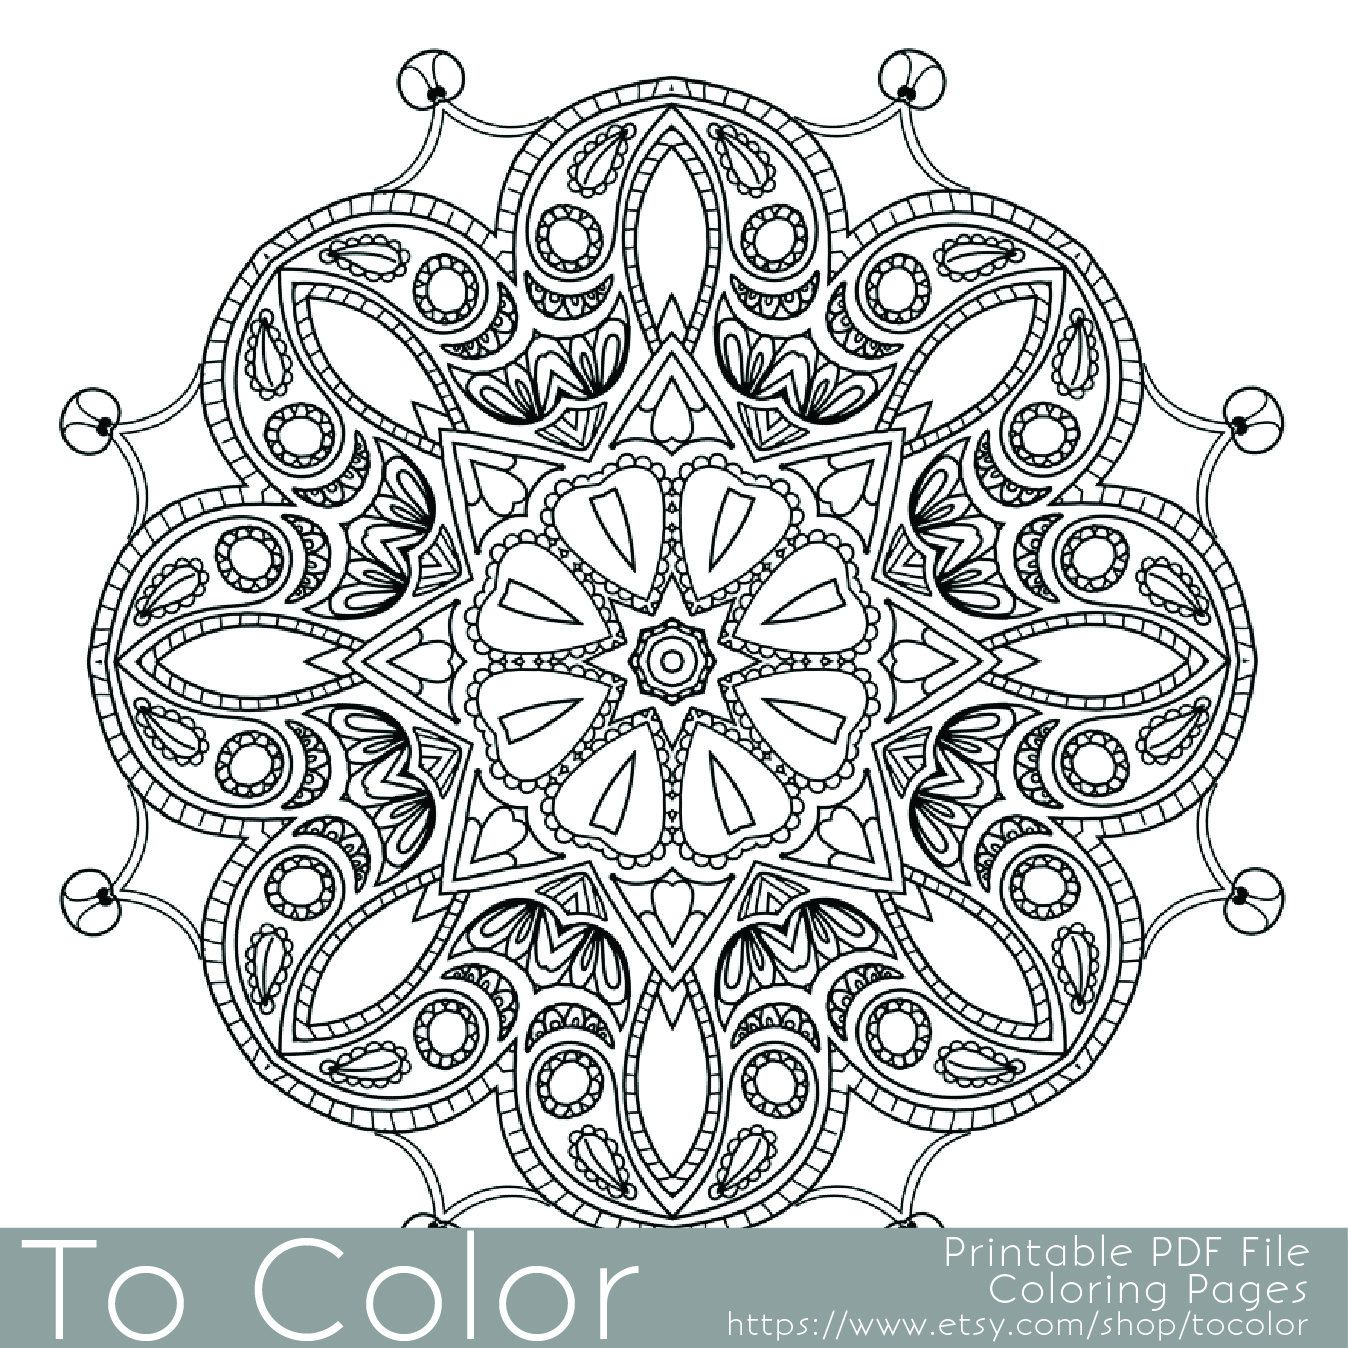 Intricate Printable Coloring Pages For Adults Gel Pens Mandala Pattern Pdf Jpg Instant Coloring Pages Mandala Coloring Books Coloring Pages For Grown Ups